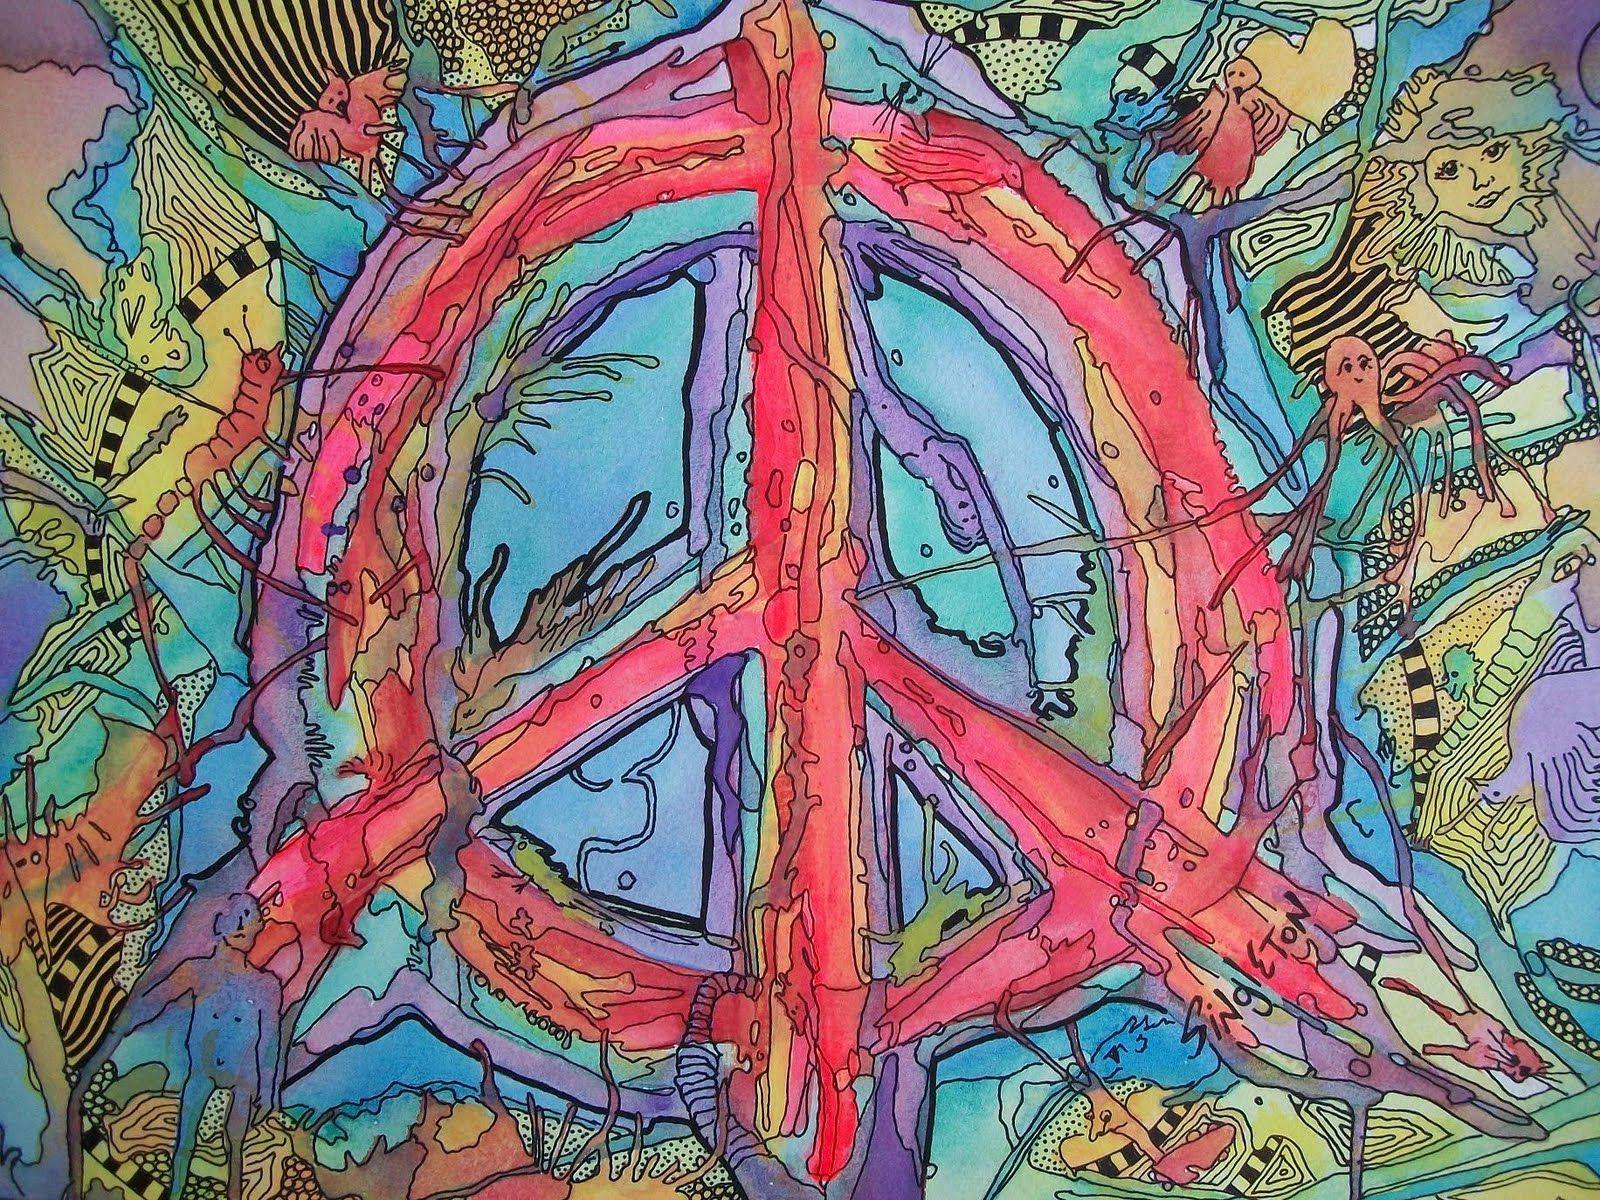 Psychedelic Dreams', artwork by Singleton. 'To fathom Hell or soar ...